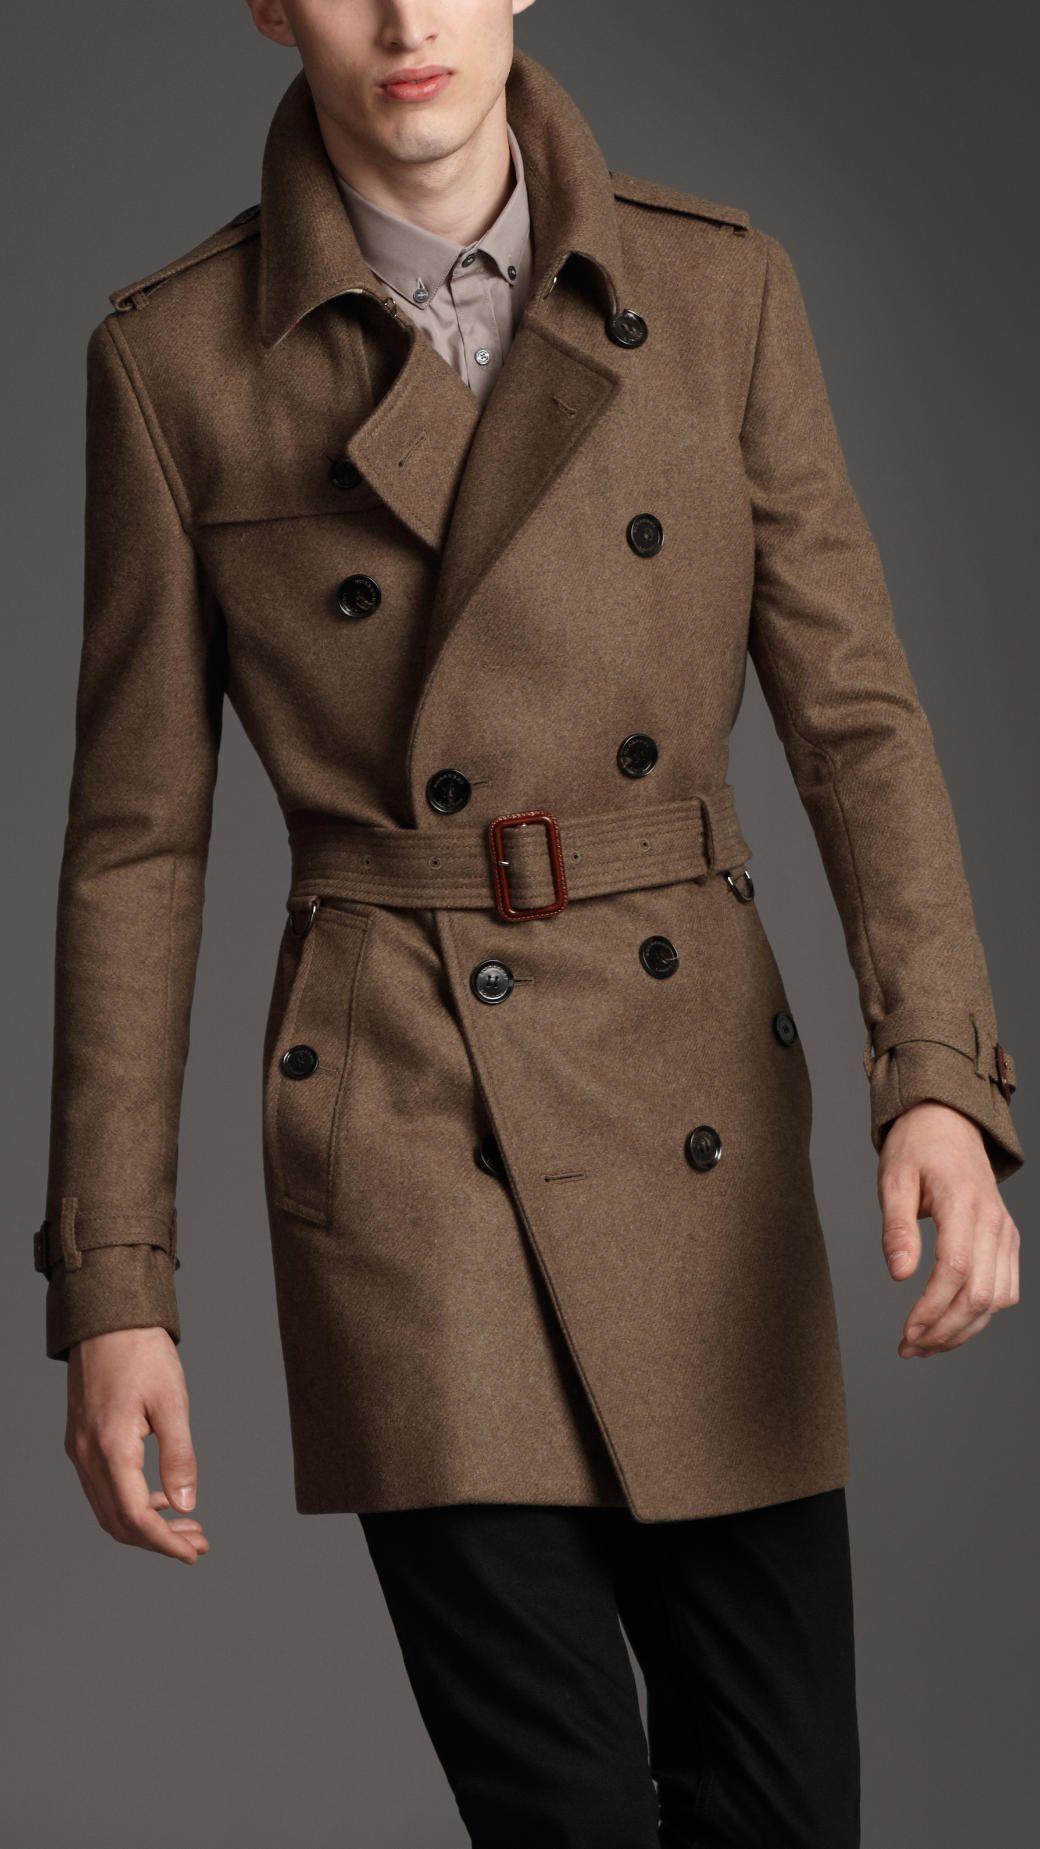 Burberry London mens textured wool trench coat 1 | Мужское пальто ...